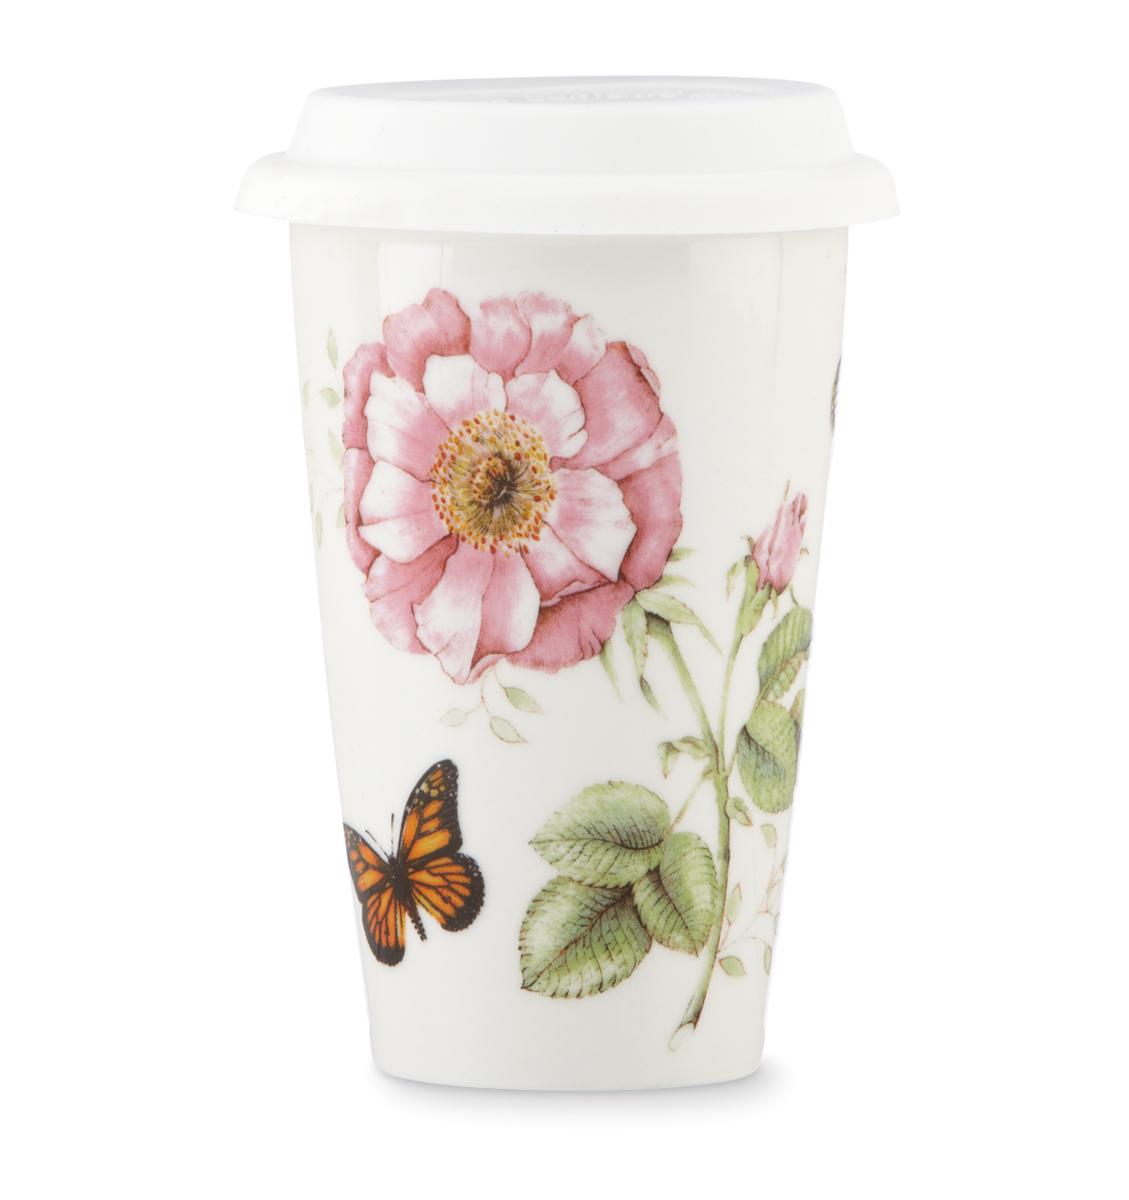 Lenox Butterfly Meadow Dinnerware Thermal Travel Mug